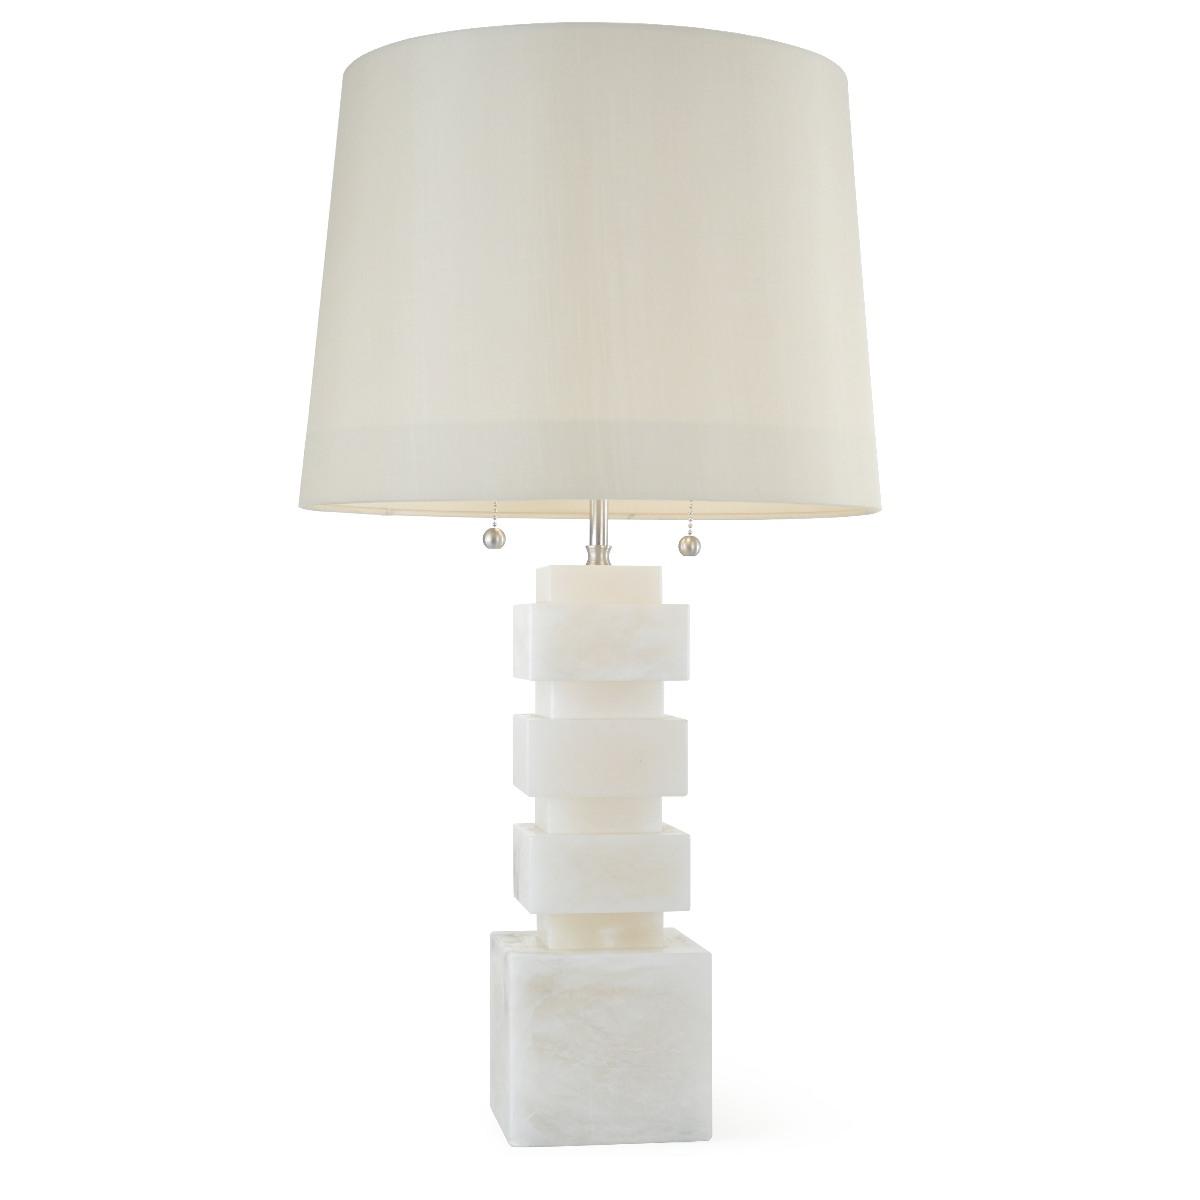 miller lamp photo - 3